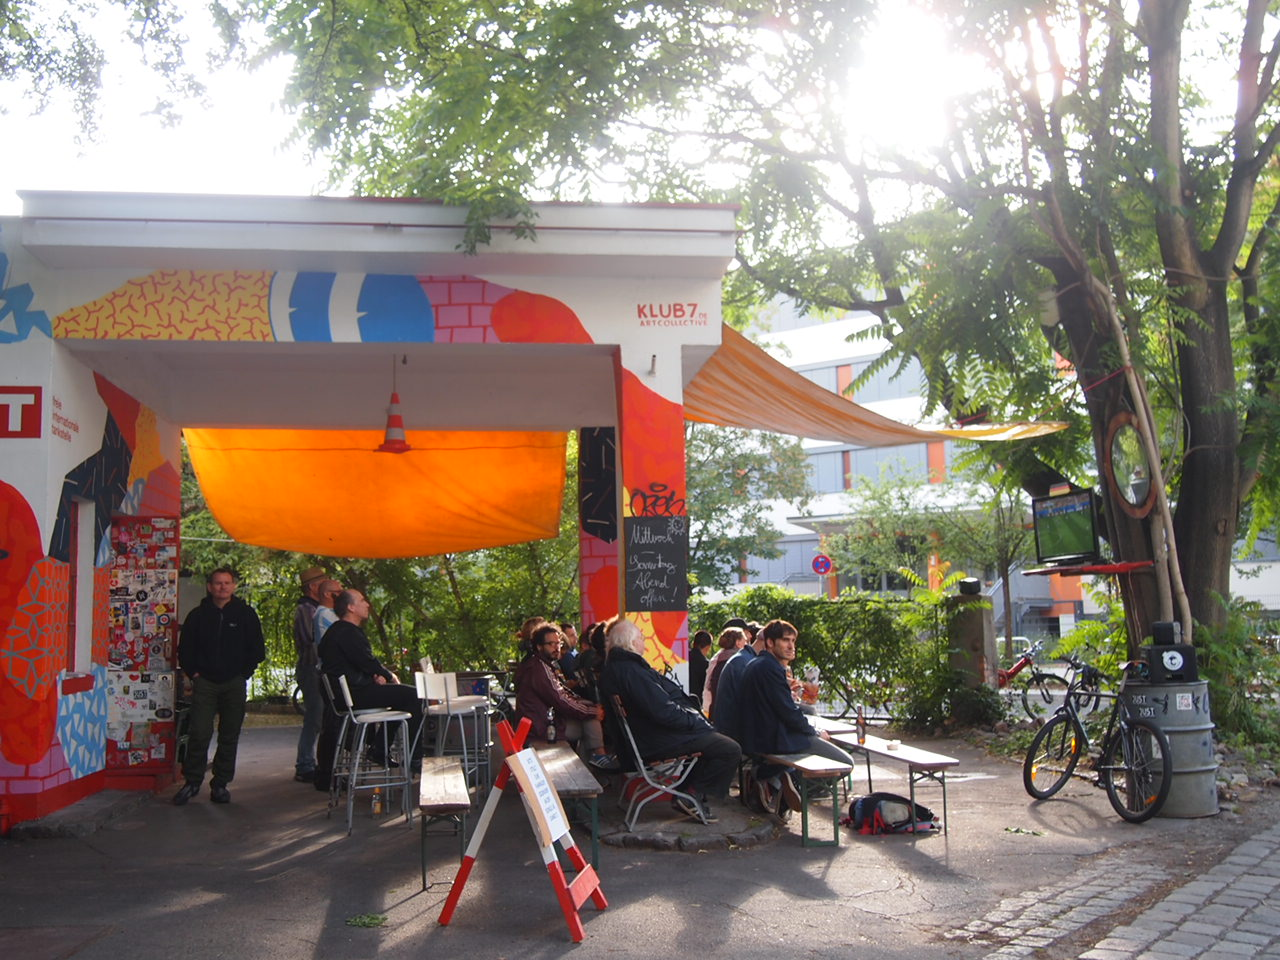 P6306193 アートと自然の多いベルリンの街並み